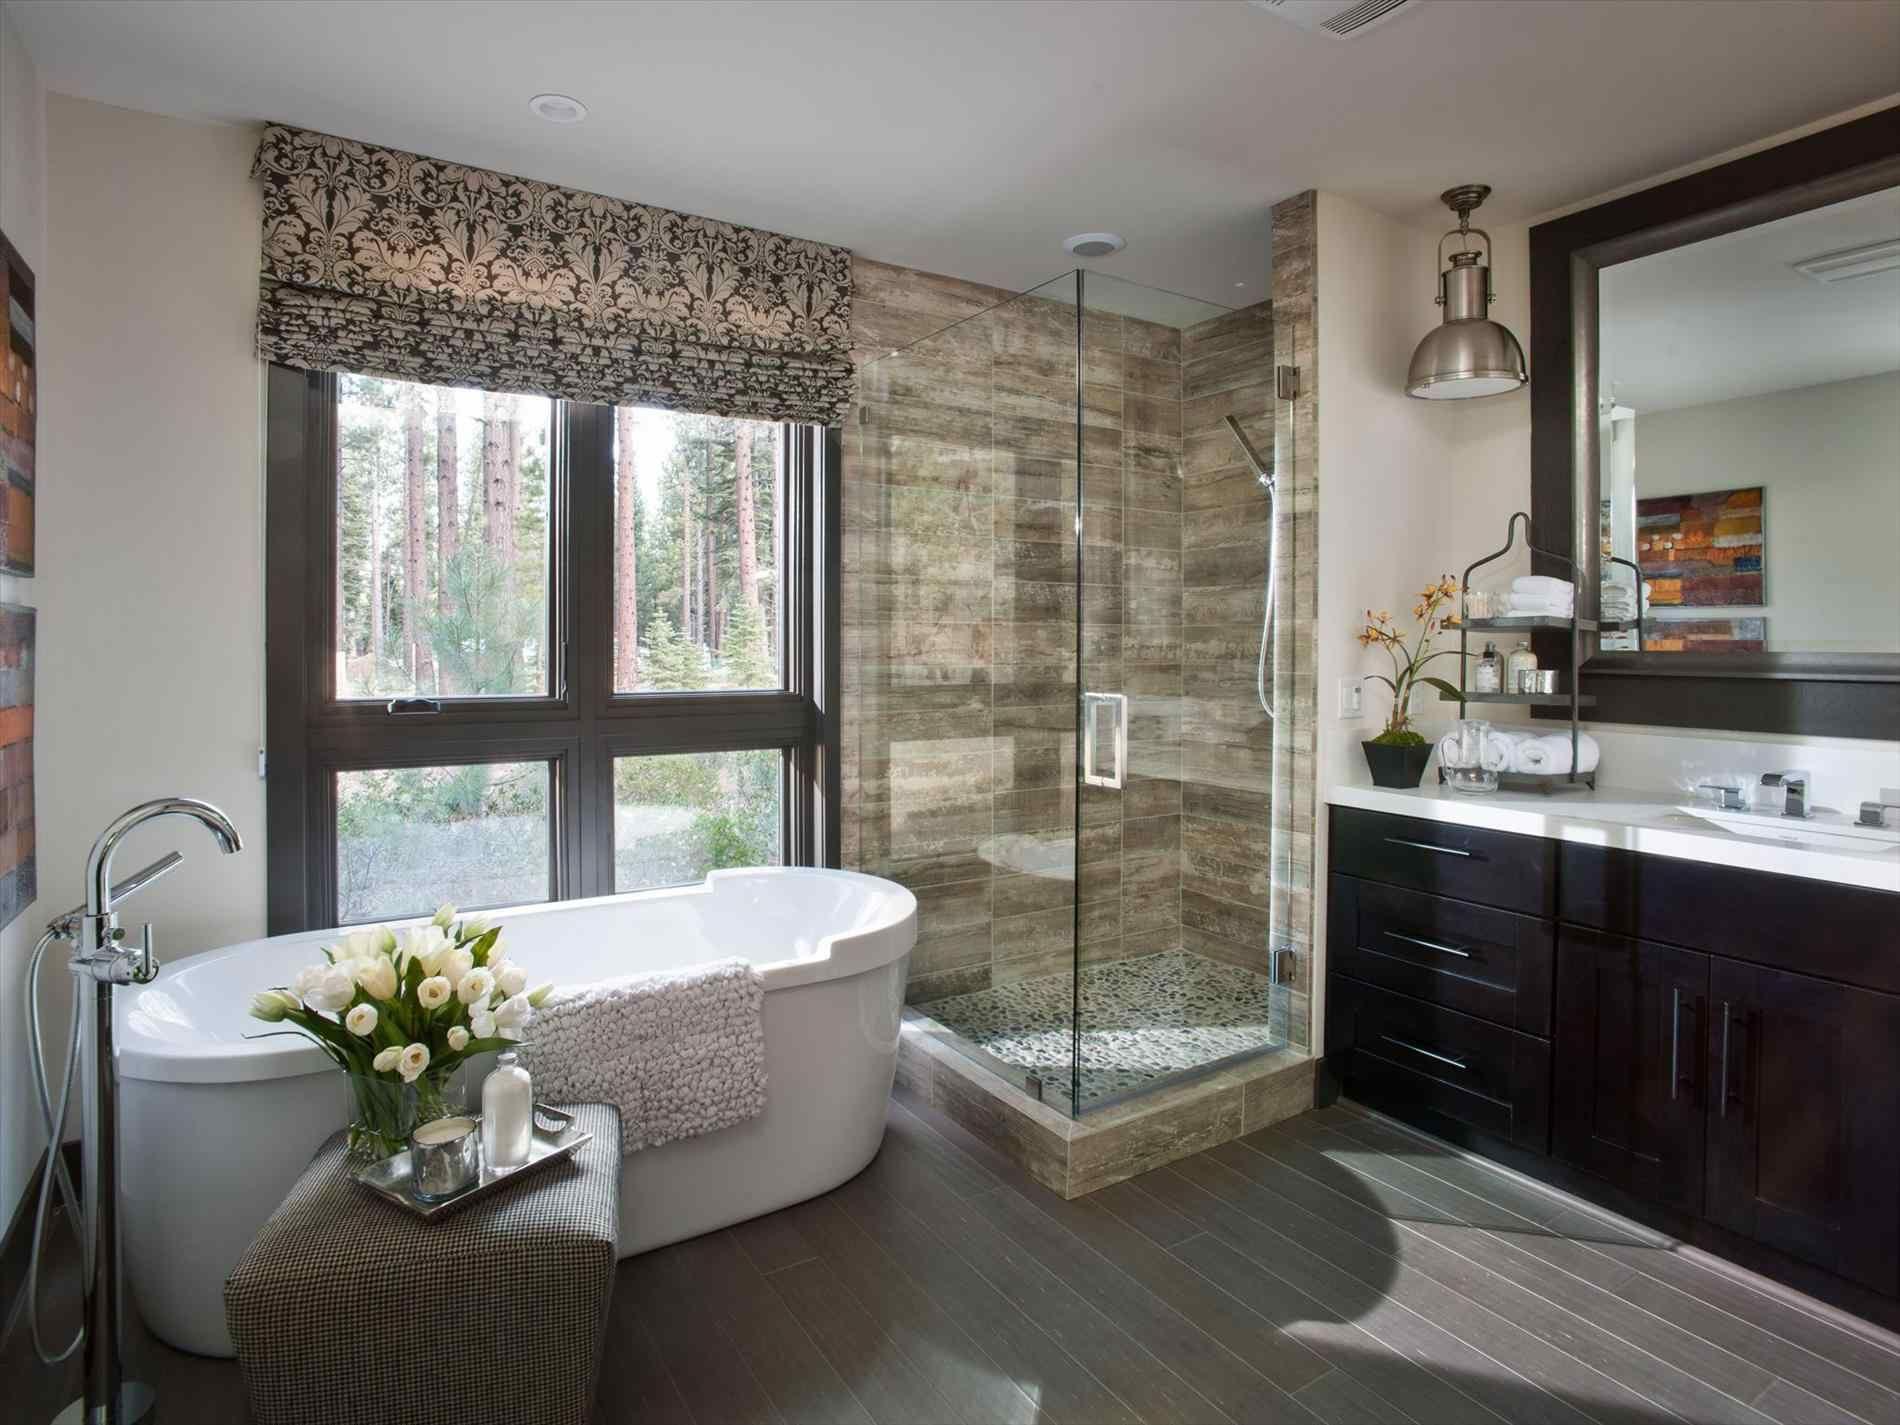 Design Proposed Square Master Bathroom Layouts Floor Plan Master Bath Bathroom Imag Modern Master Bathroom Design Modern Master Bathroom Master Bathroom Layout